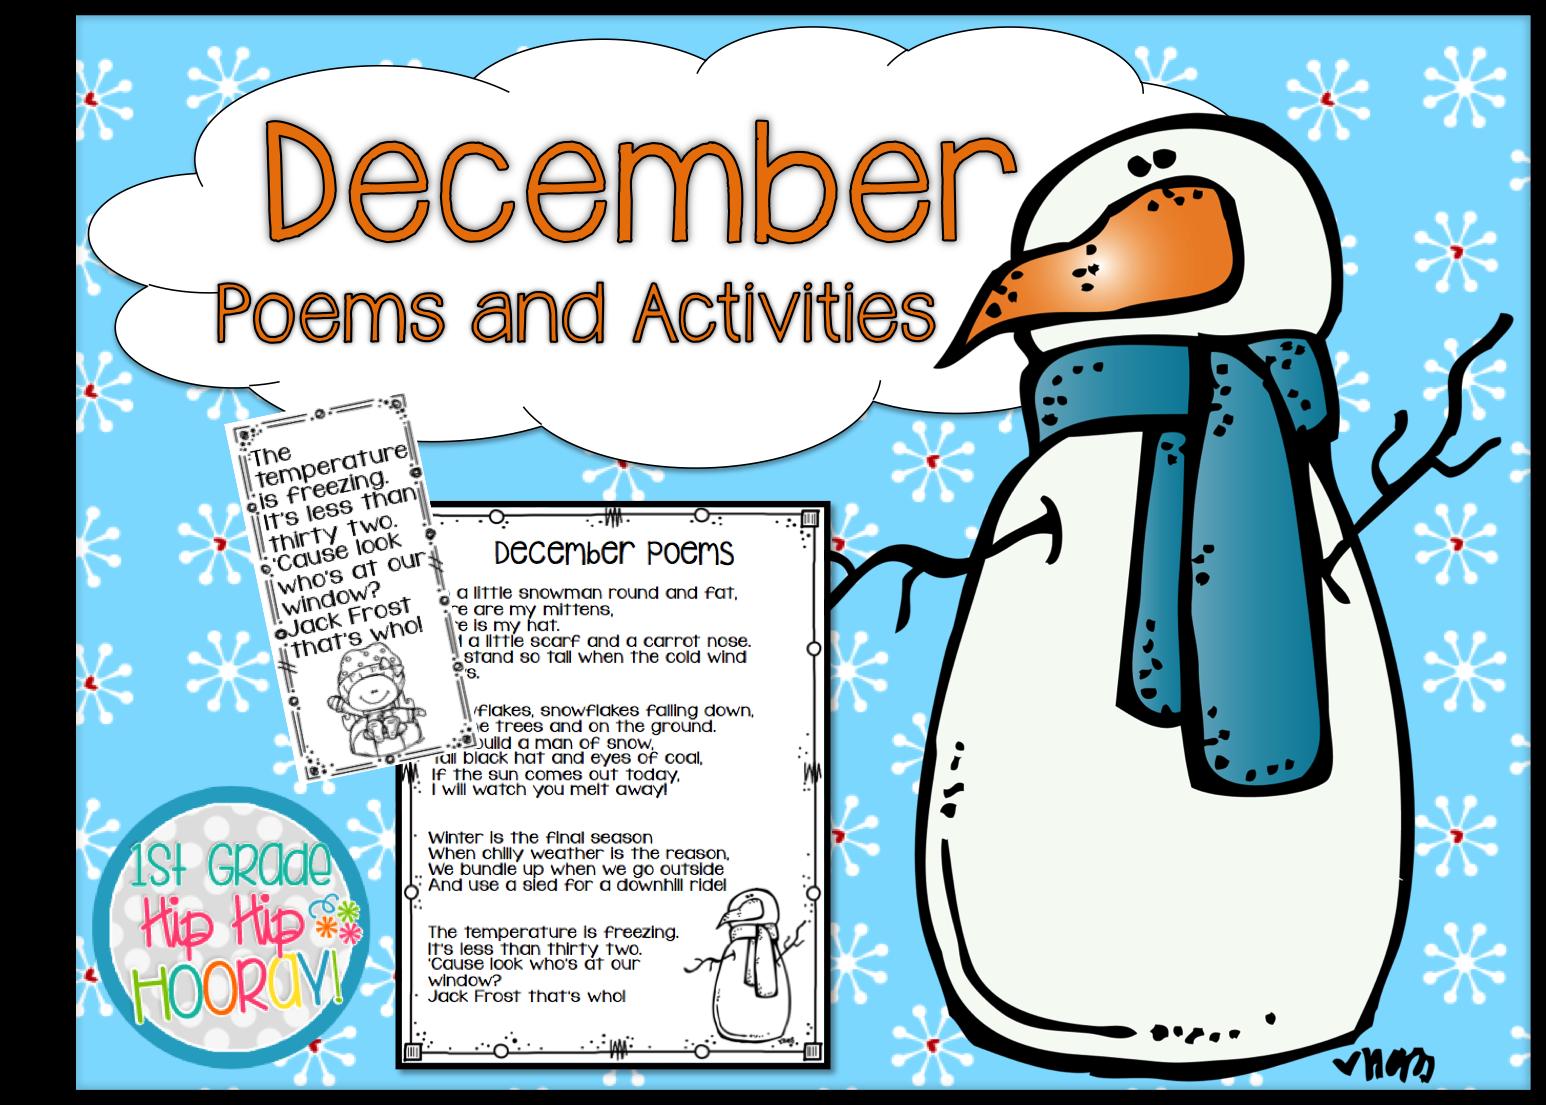 1st Grade Hip Hip Hooray!: December Poems and Activities!